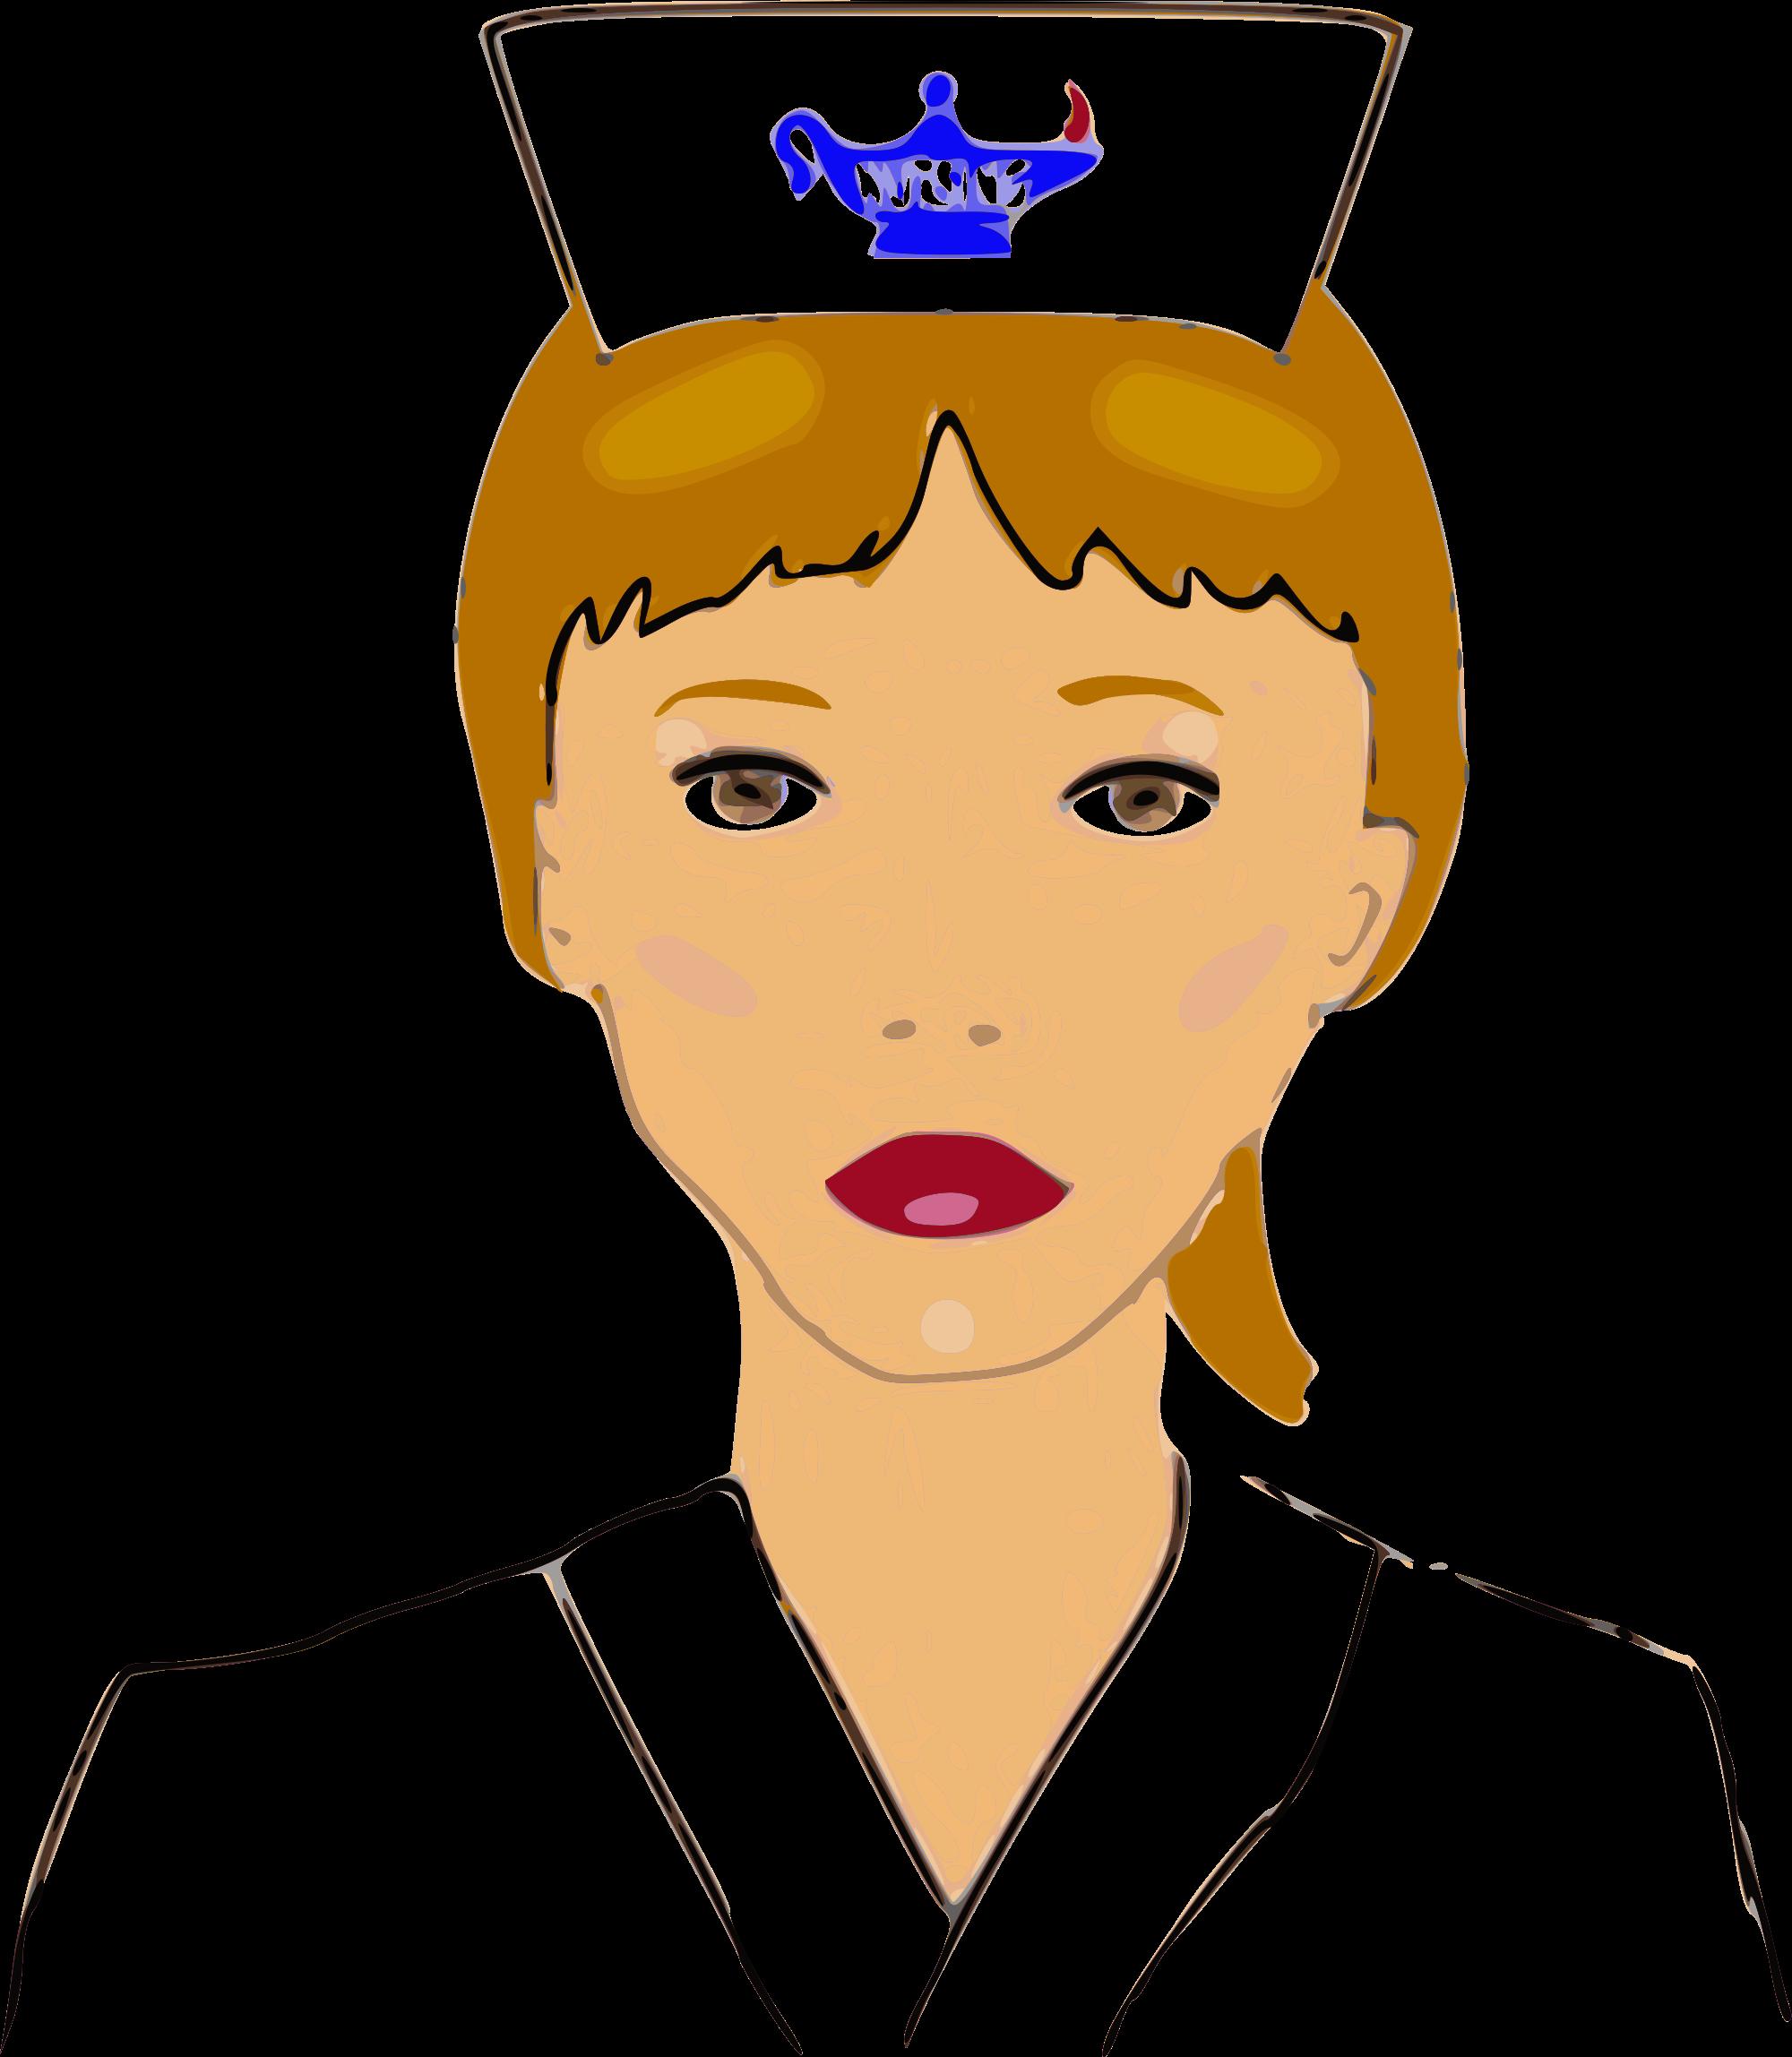 Nursing hat clip art. Nurse clipart old fashioned